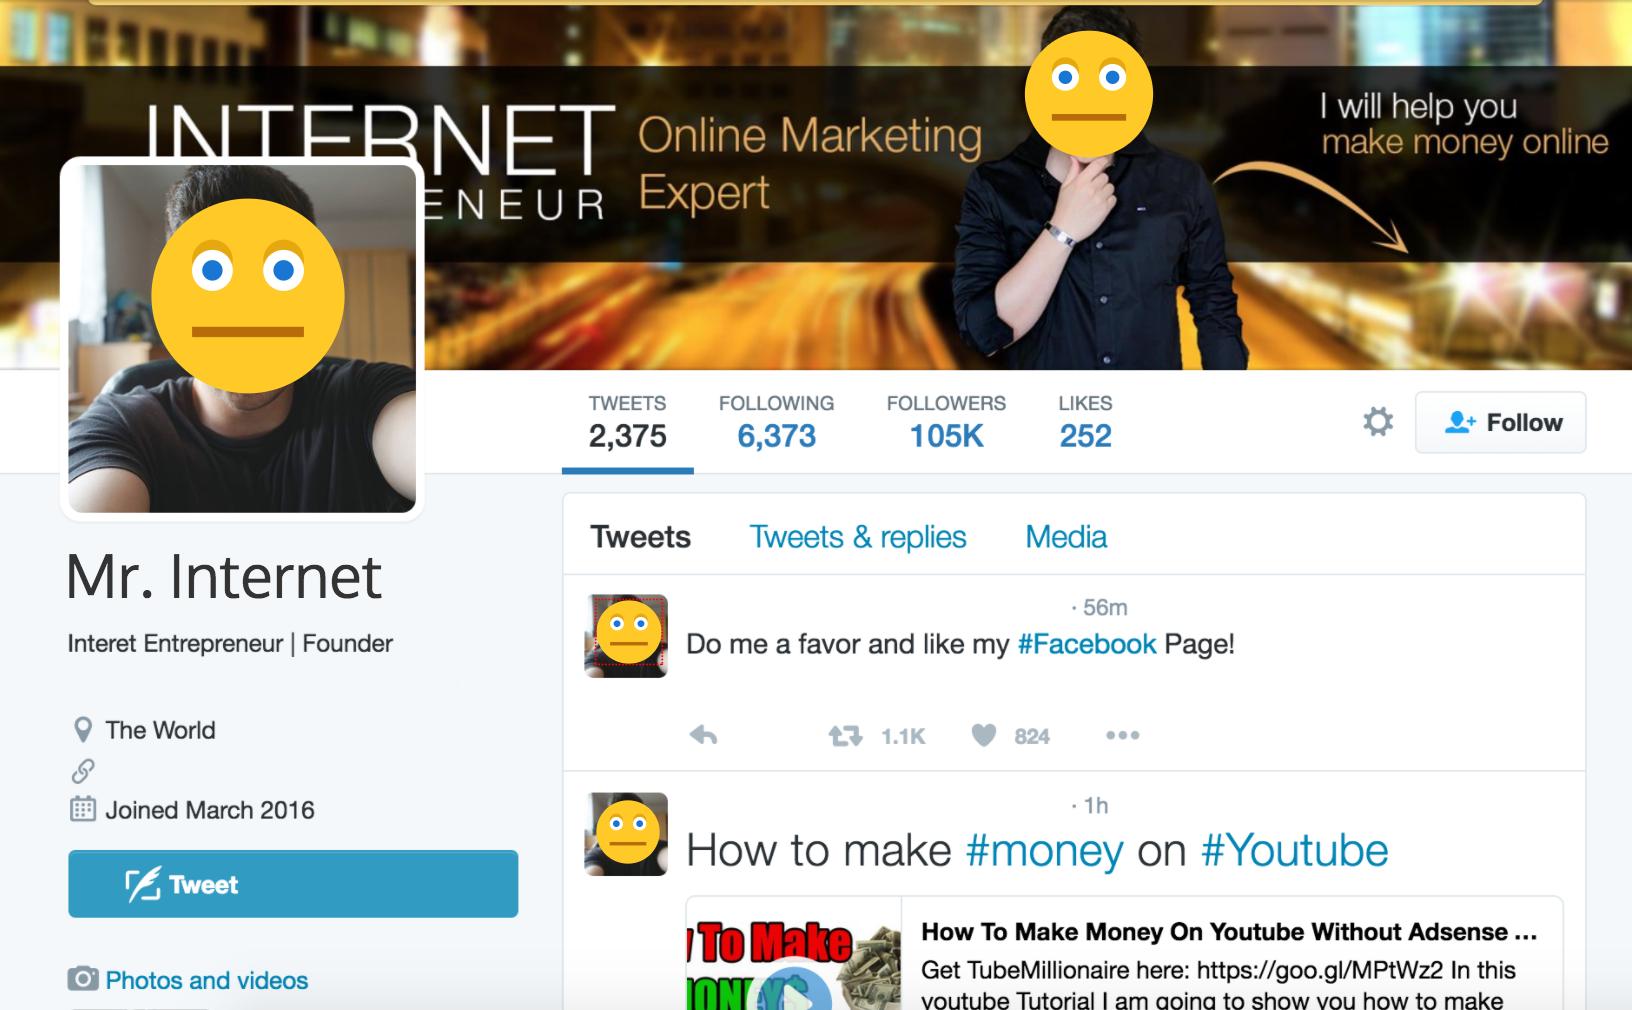 Mr Internet